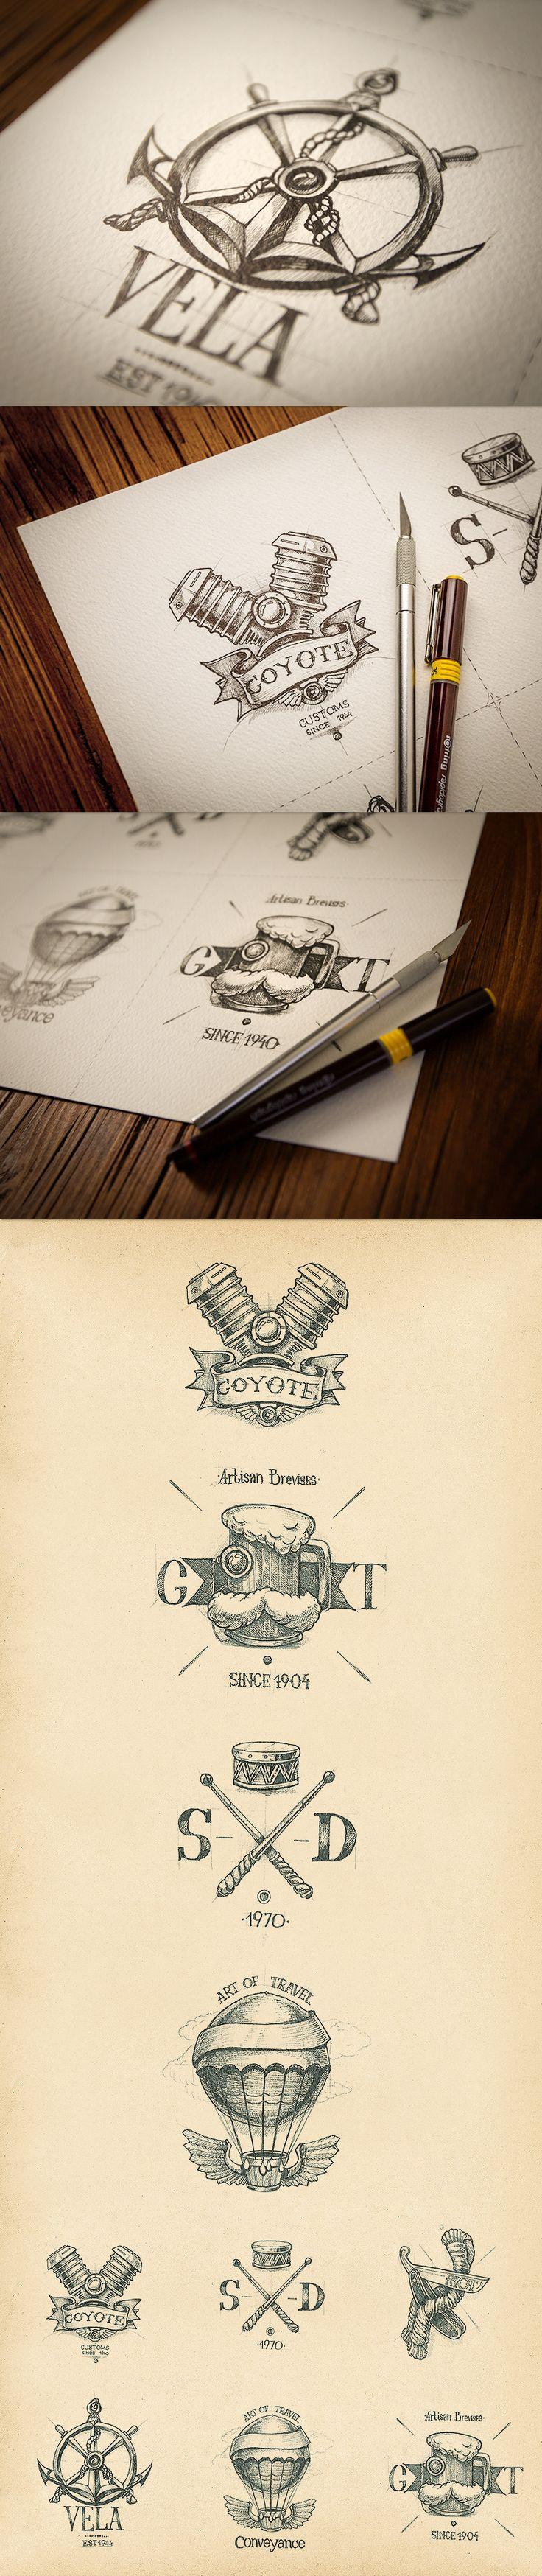 #logo #design #sketche #pencil #handmade #illustration #hipster #cool #id #branding #brand #logotype